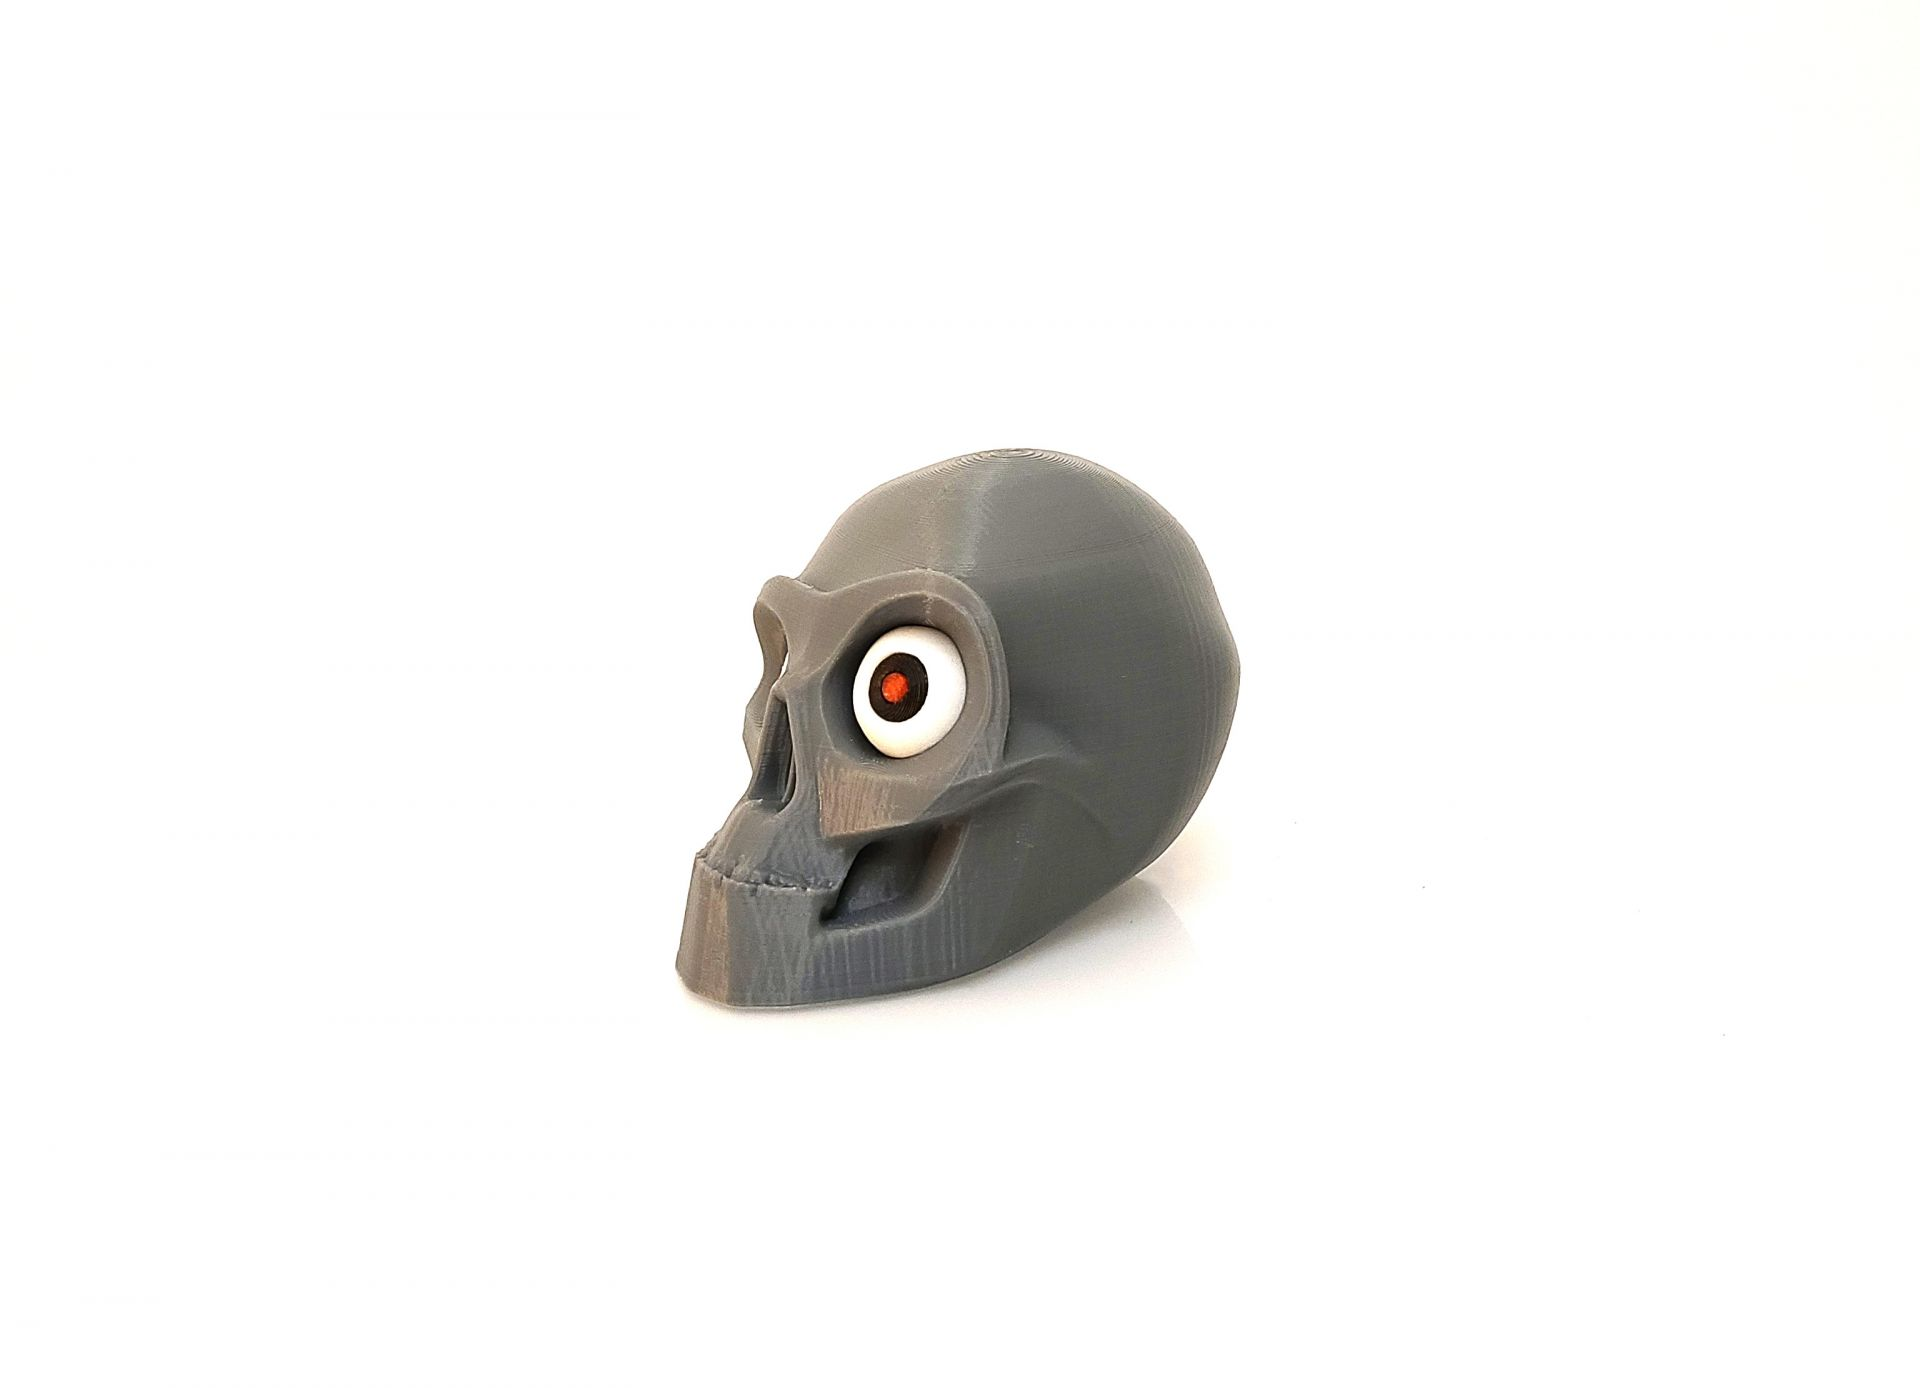 Halloween Skull Multi-Material 2020 5